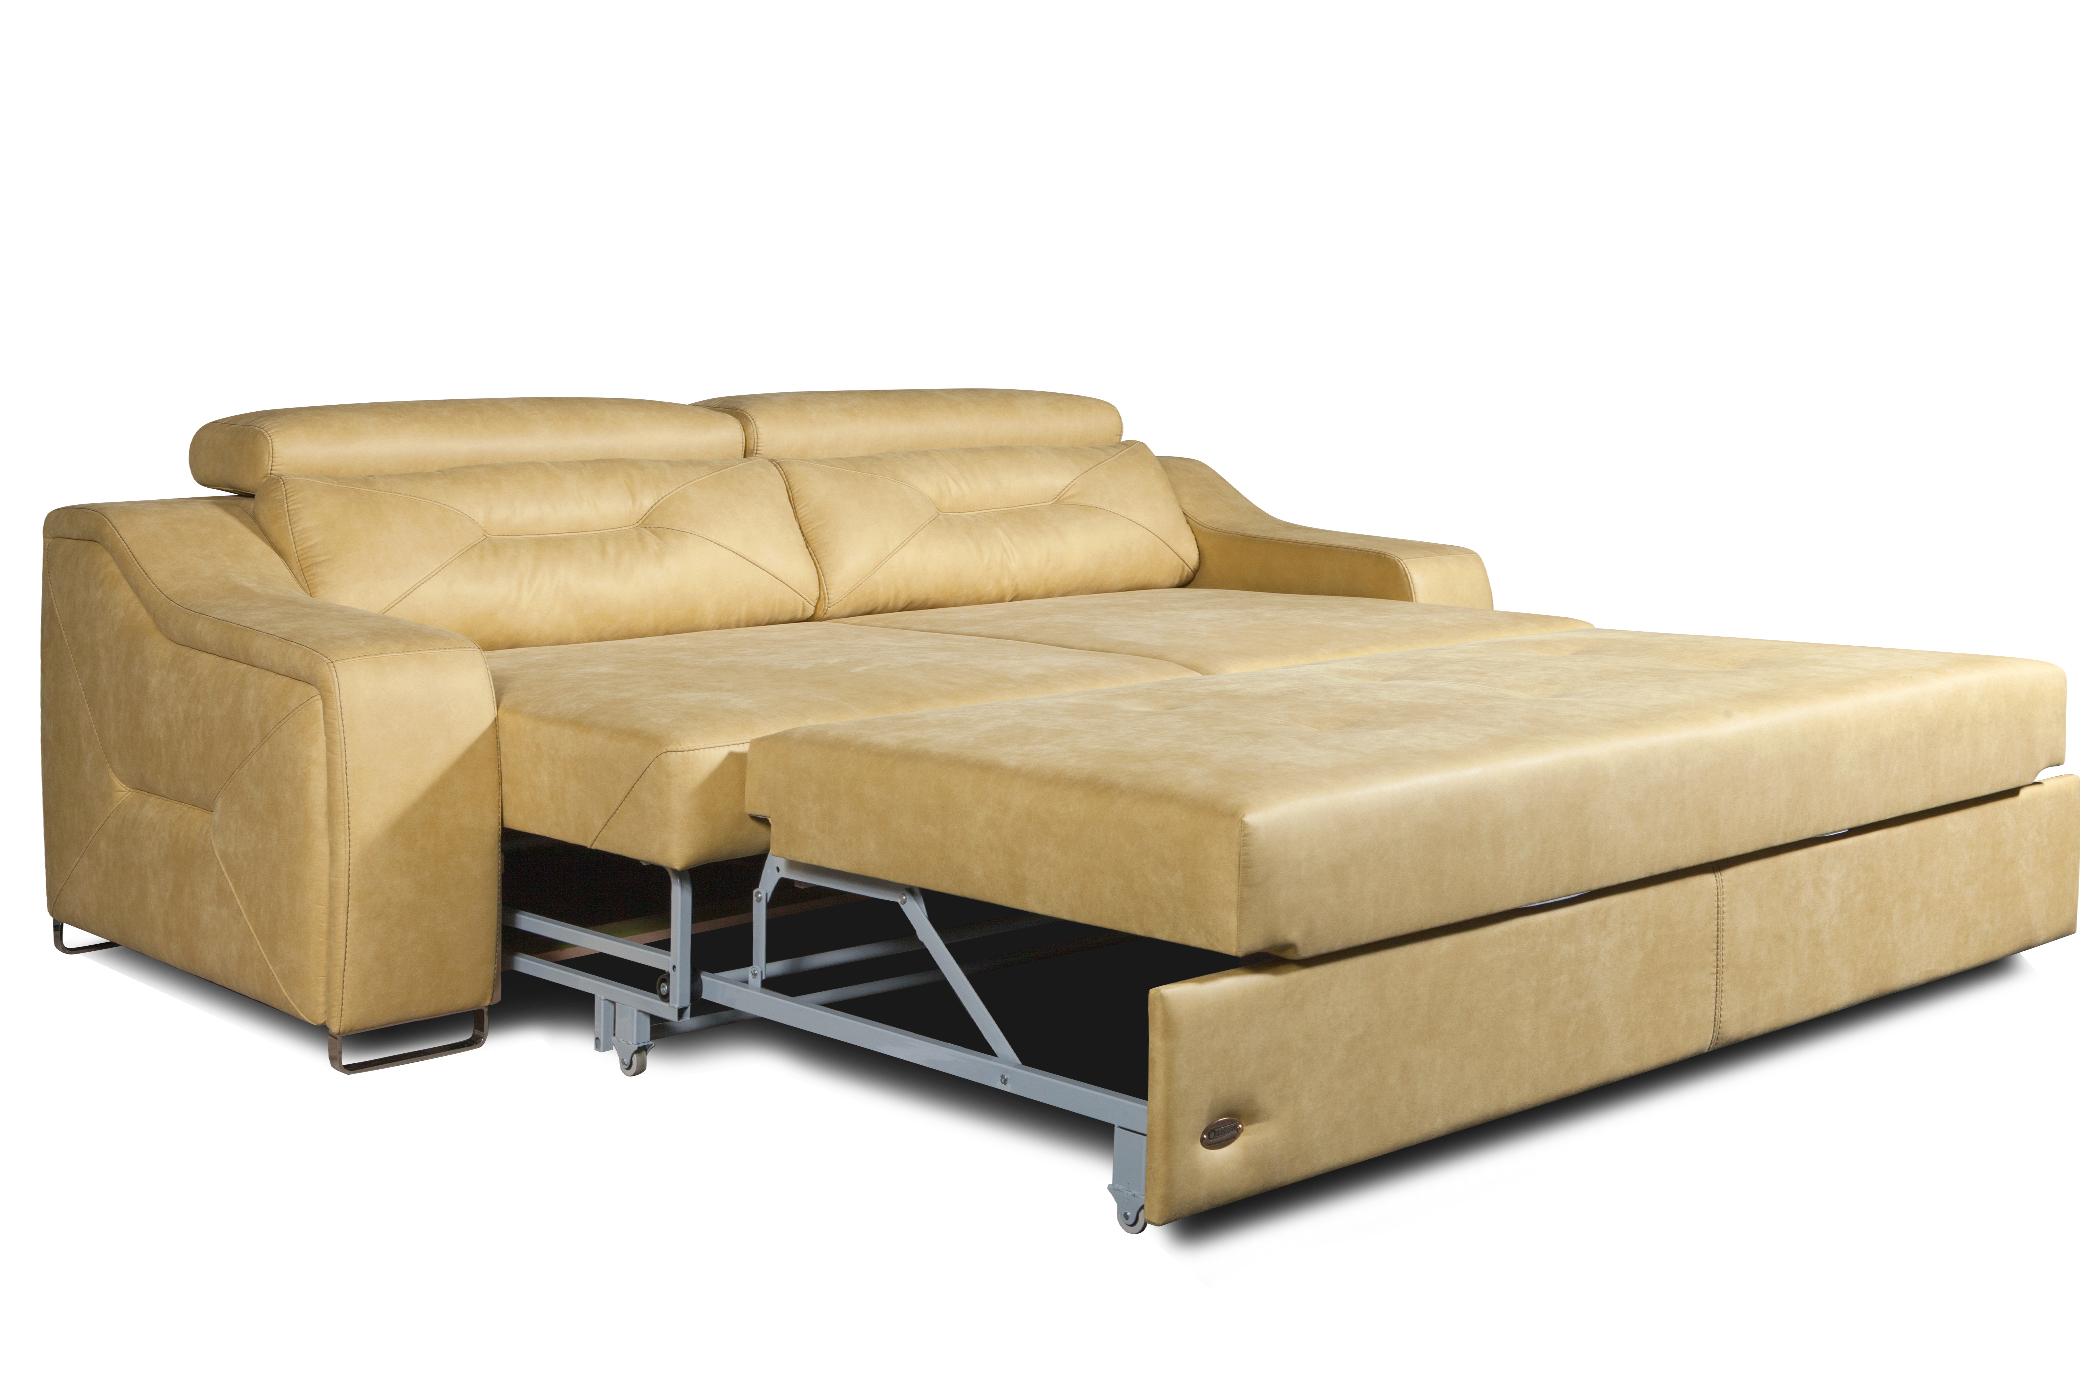 edison-comfort-003